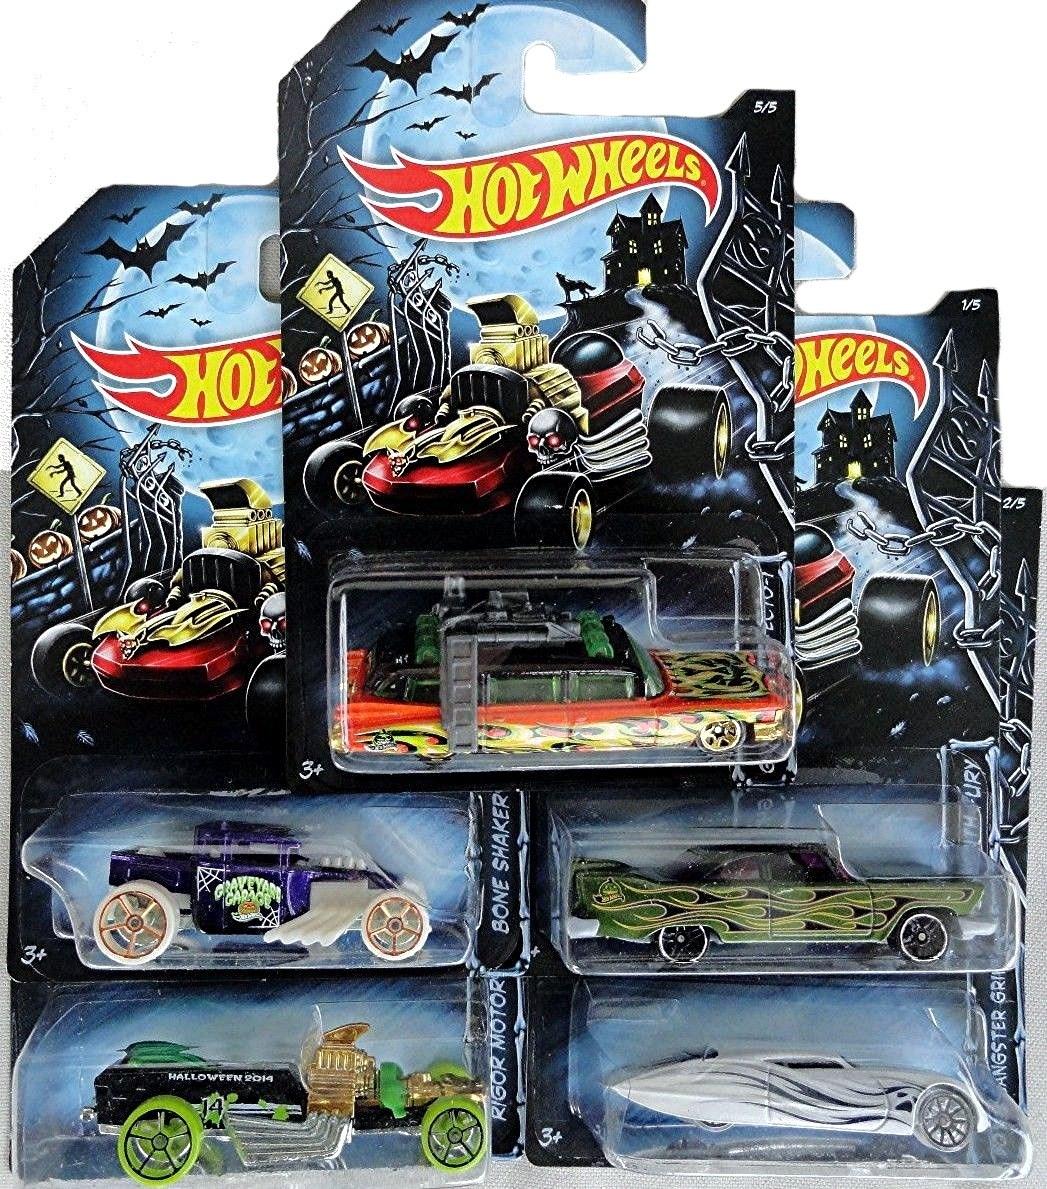 2014 Kroger Halloween Cars